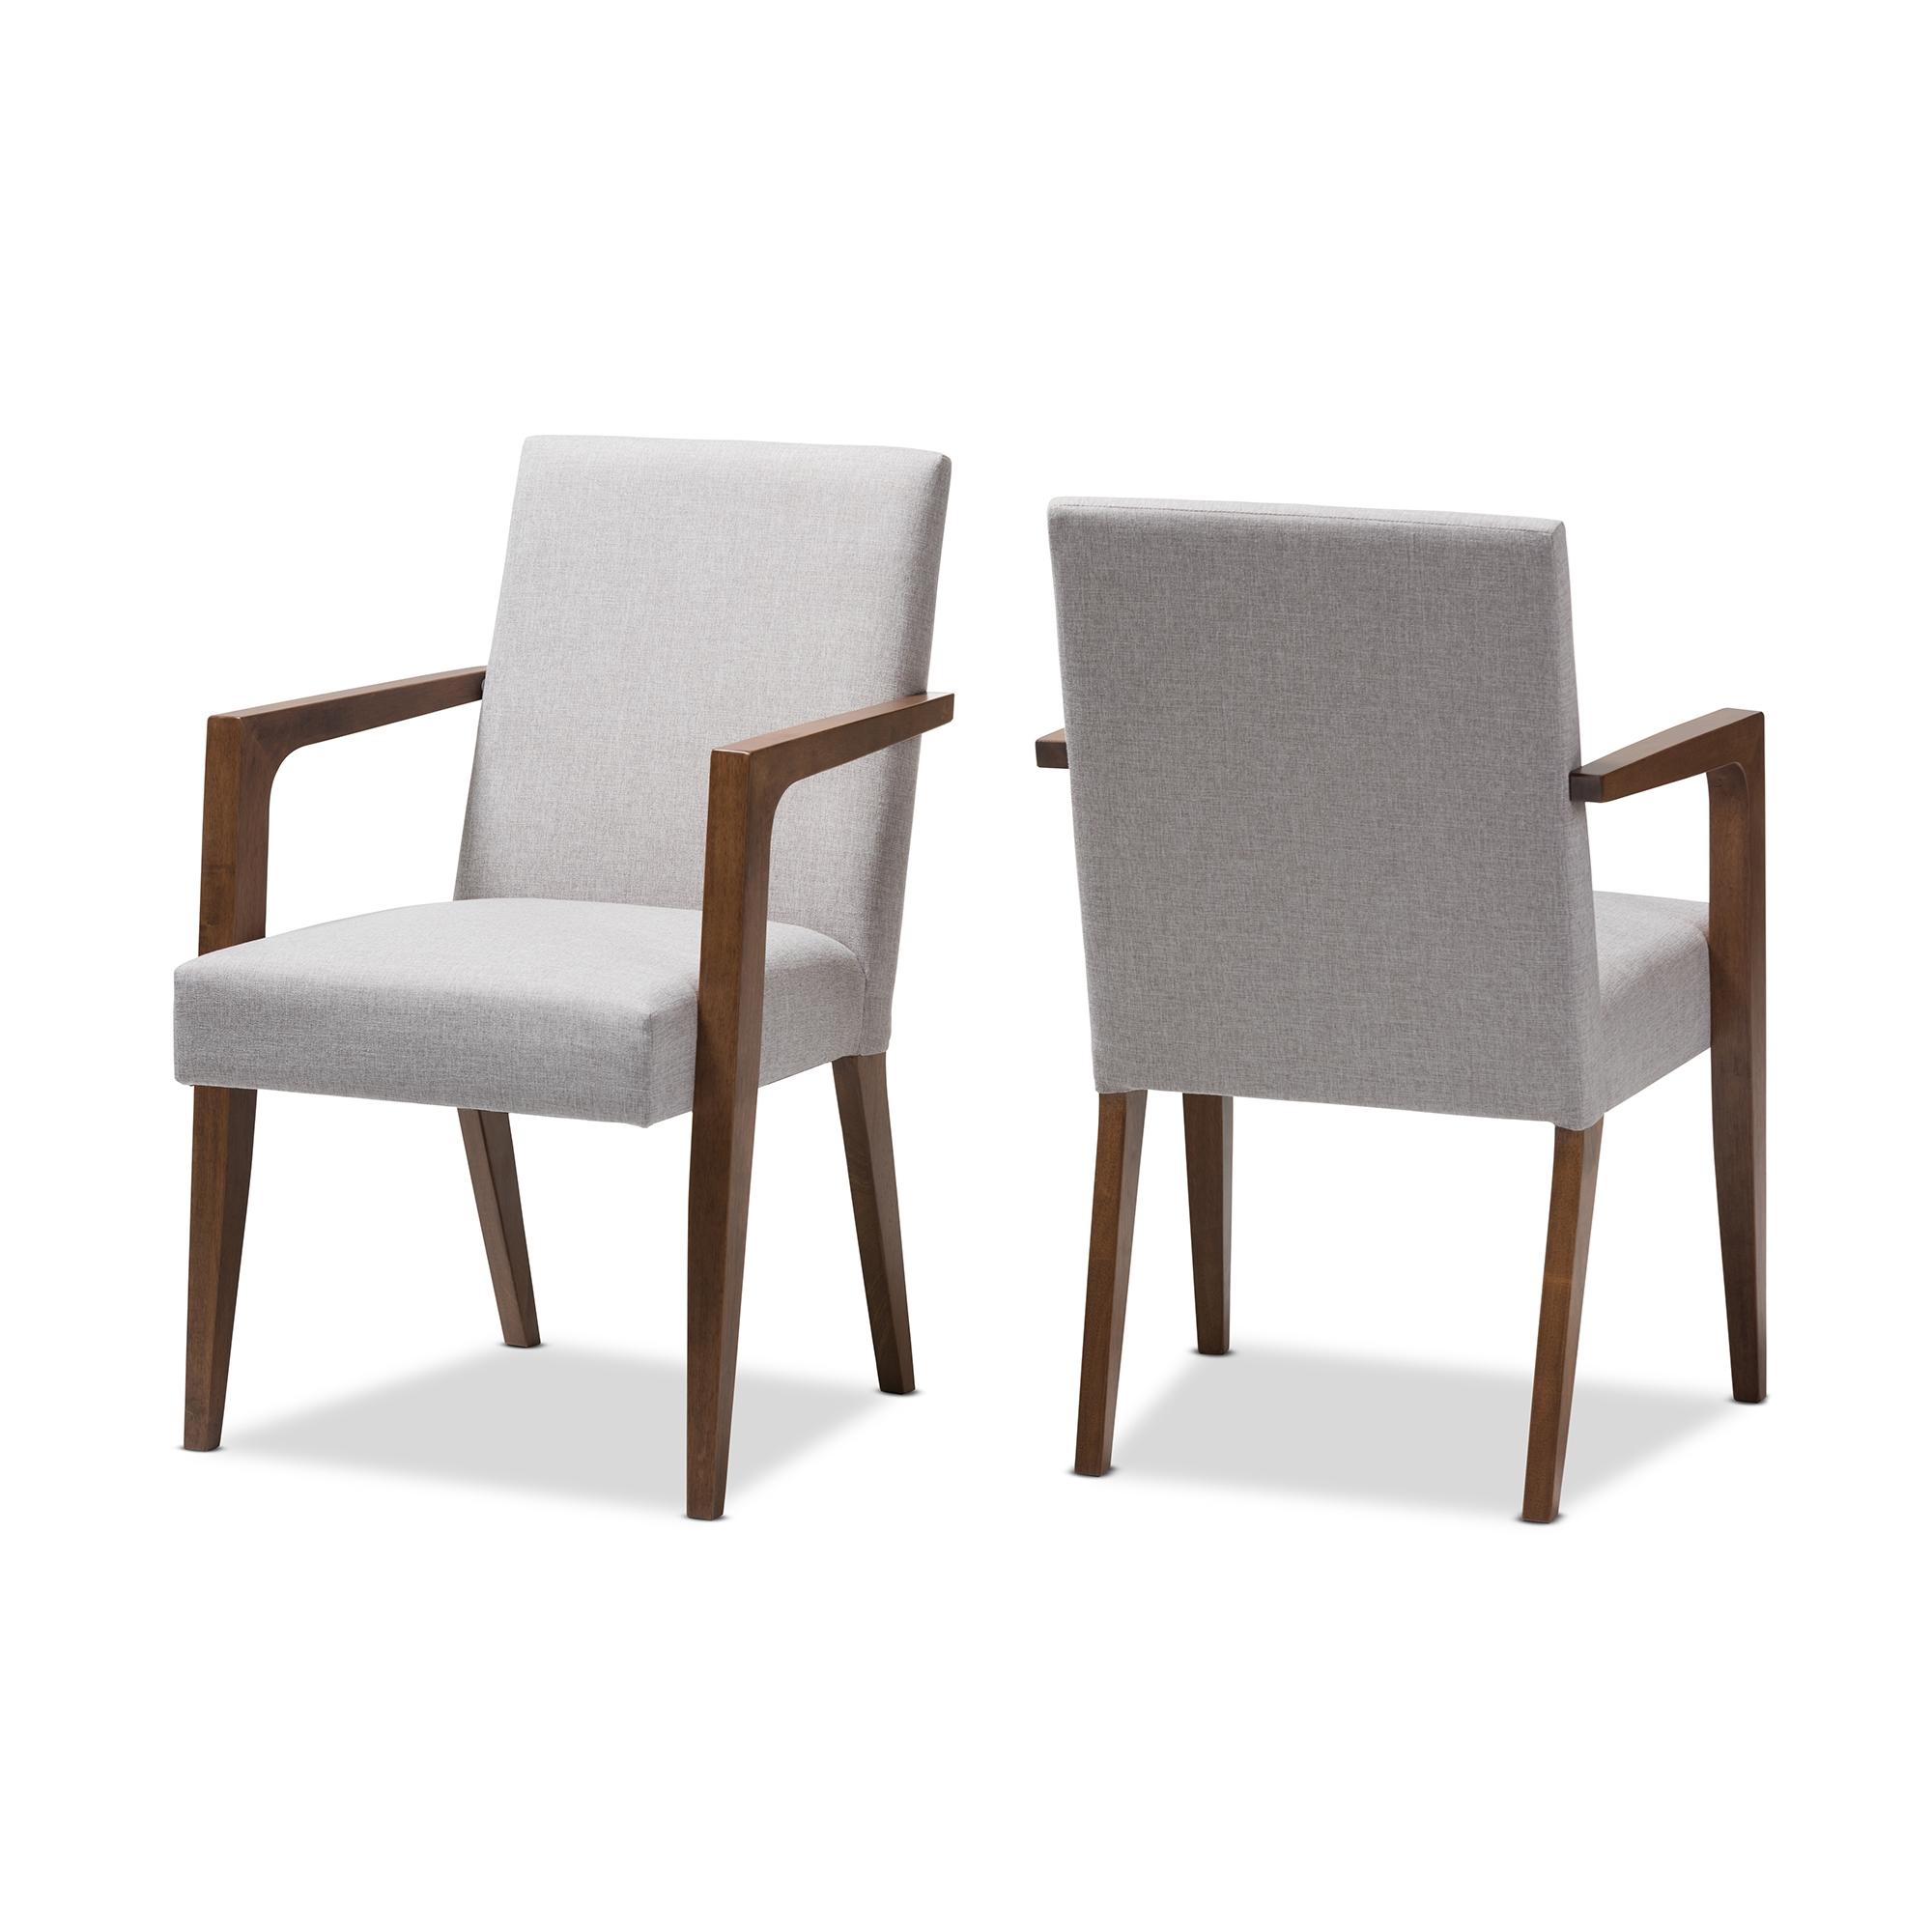 Baxton Studio Andrea Mid Century Modern Greyish Beige Upholstered Wooden  Armchair (Set Of 2)